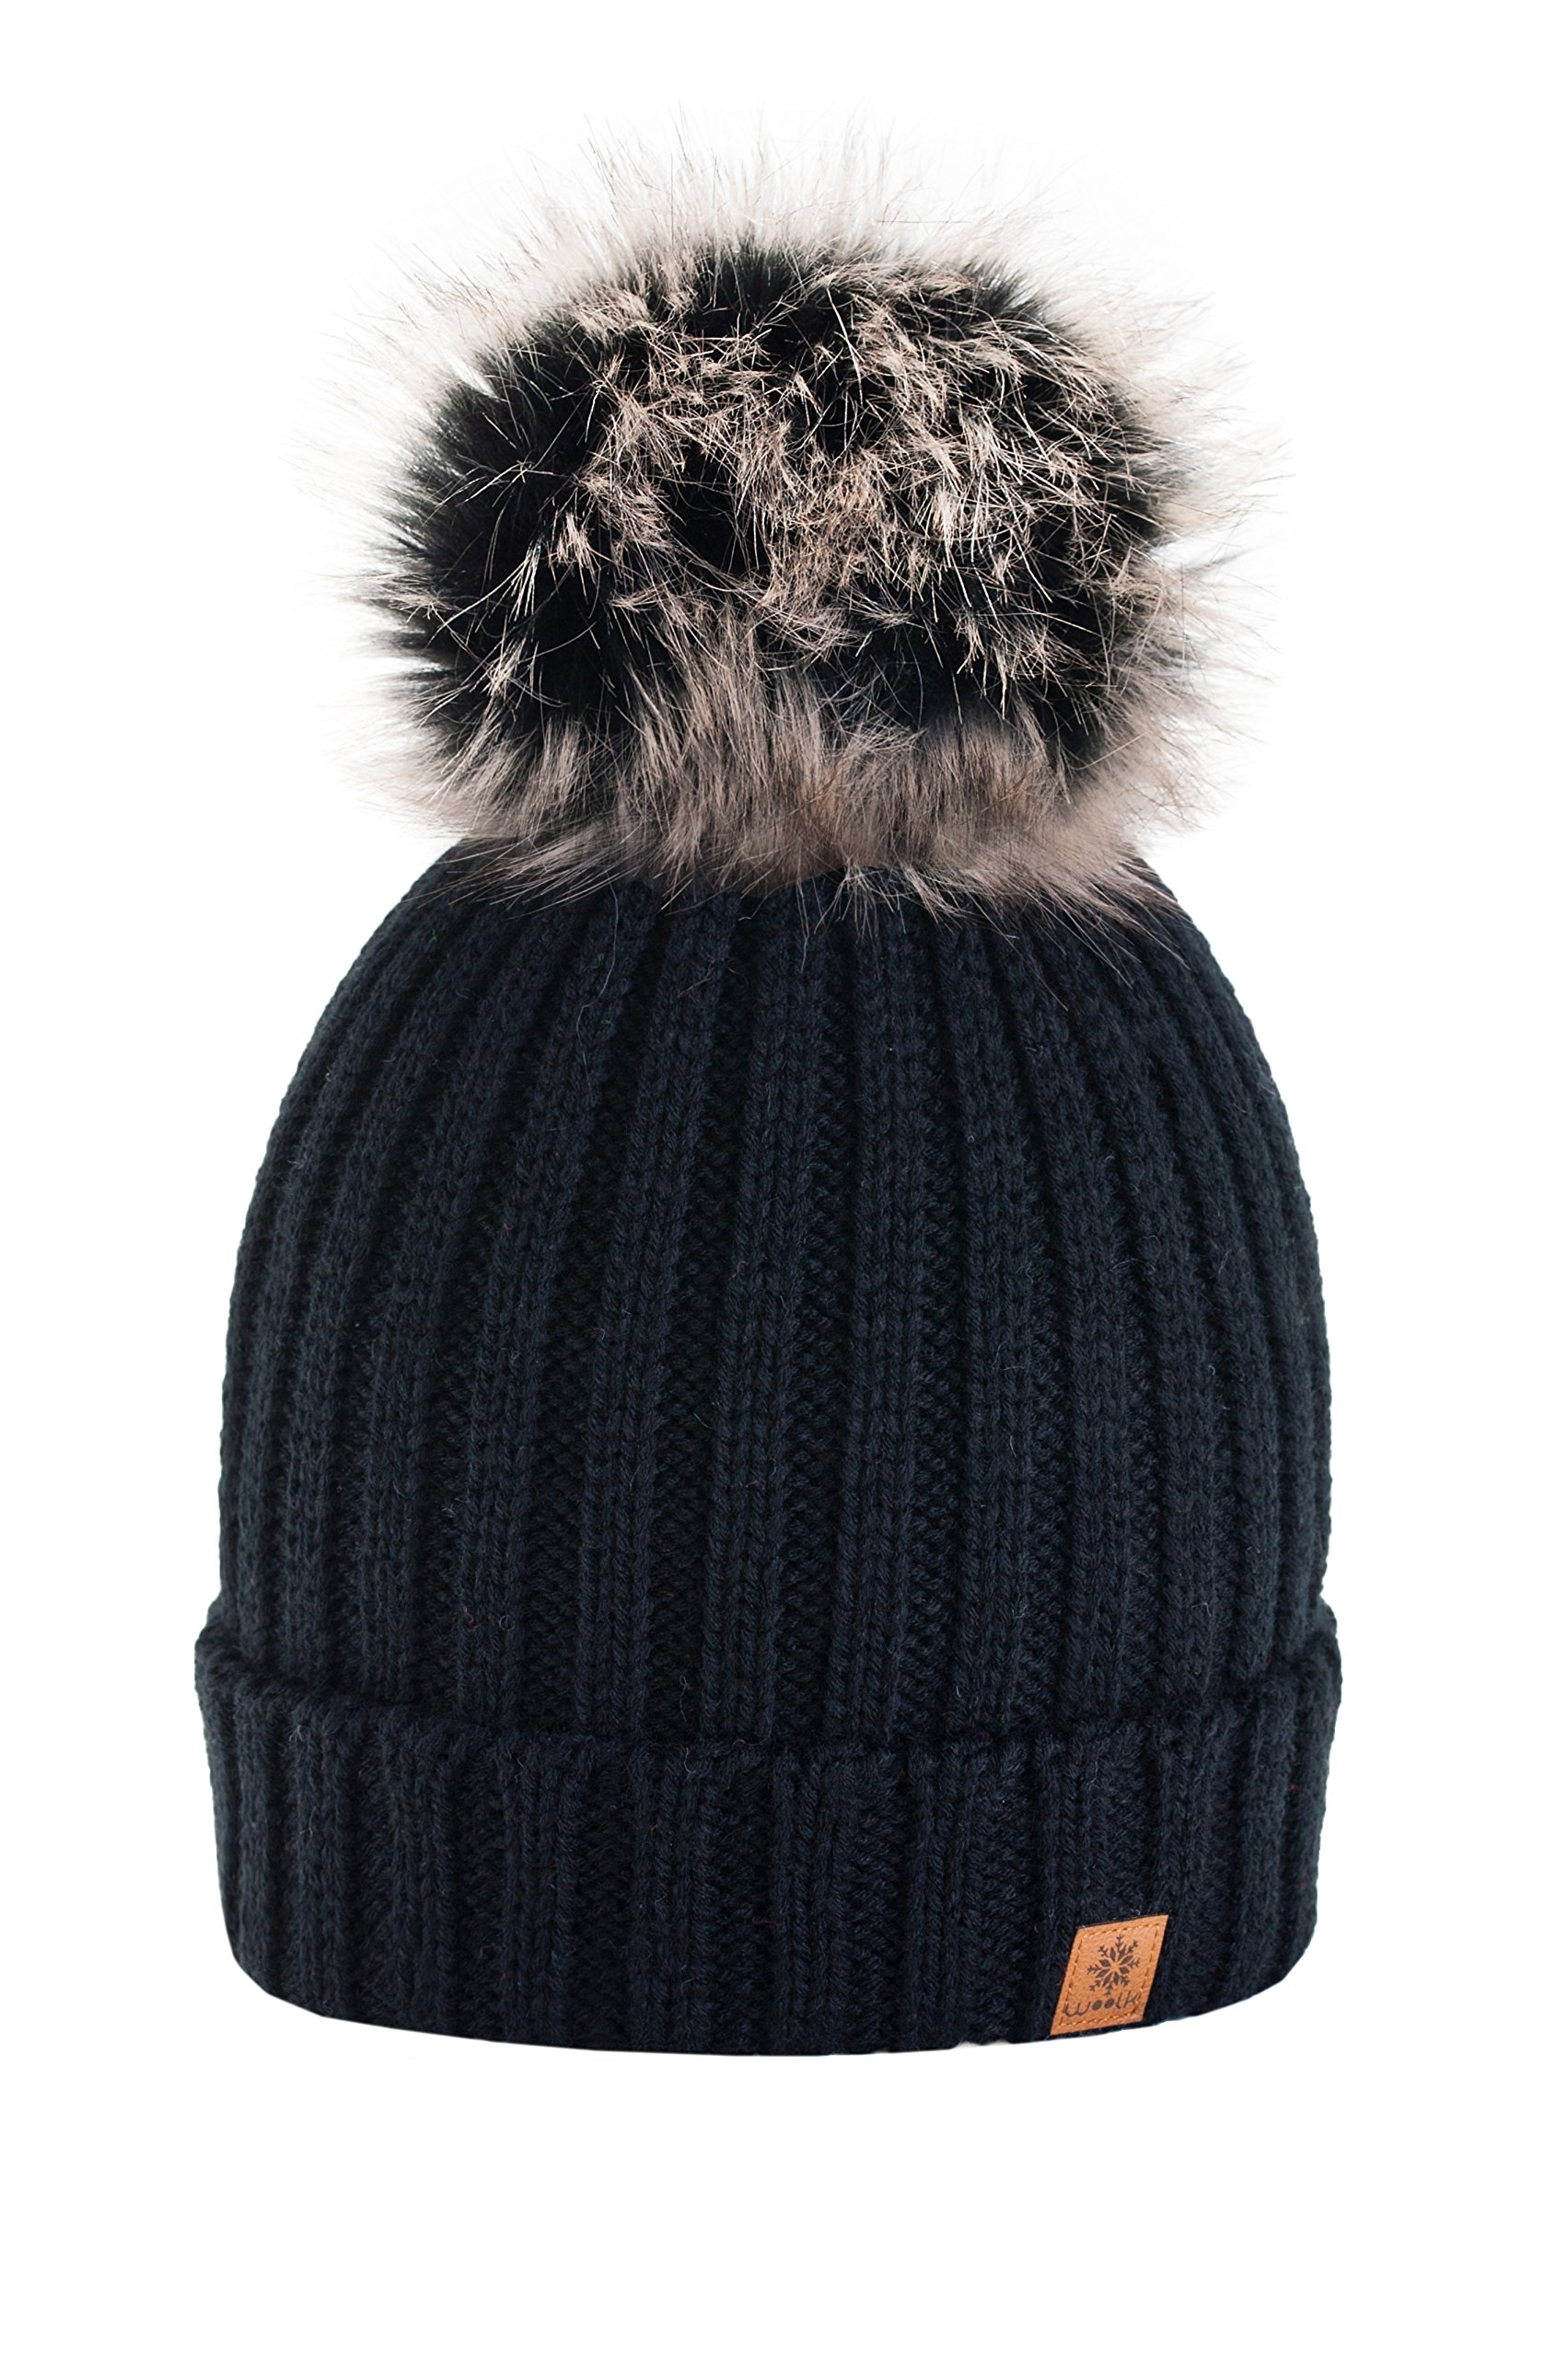 cf27a031b 4sold Rita Womens Girls Winter Hat Wool Knitted Beanie with Large Pom Pom  Cap SKI Snowboard